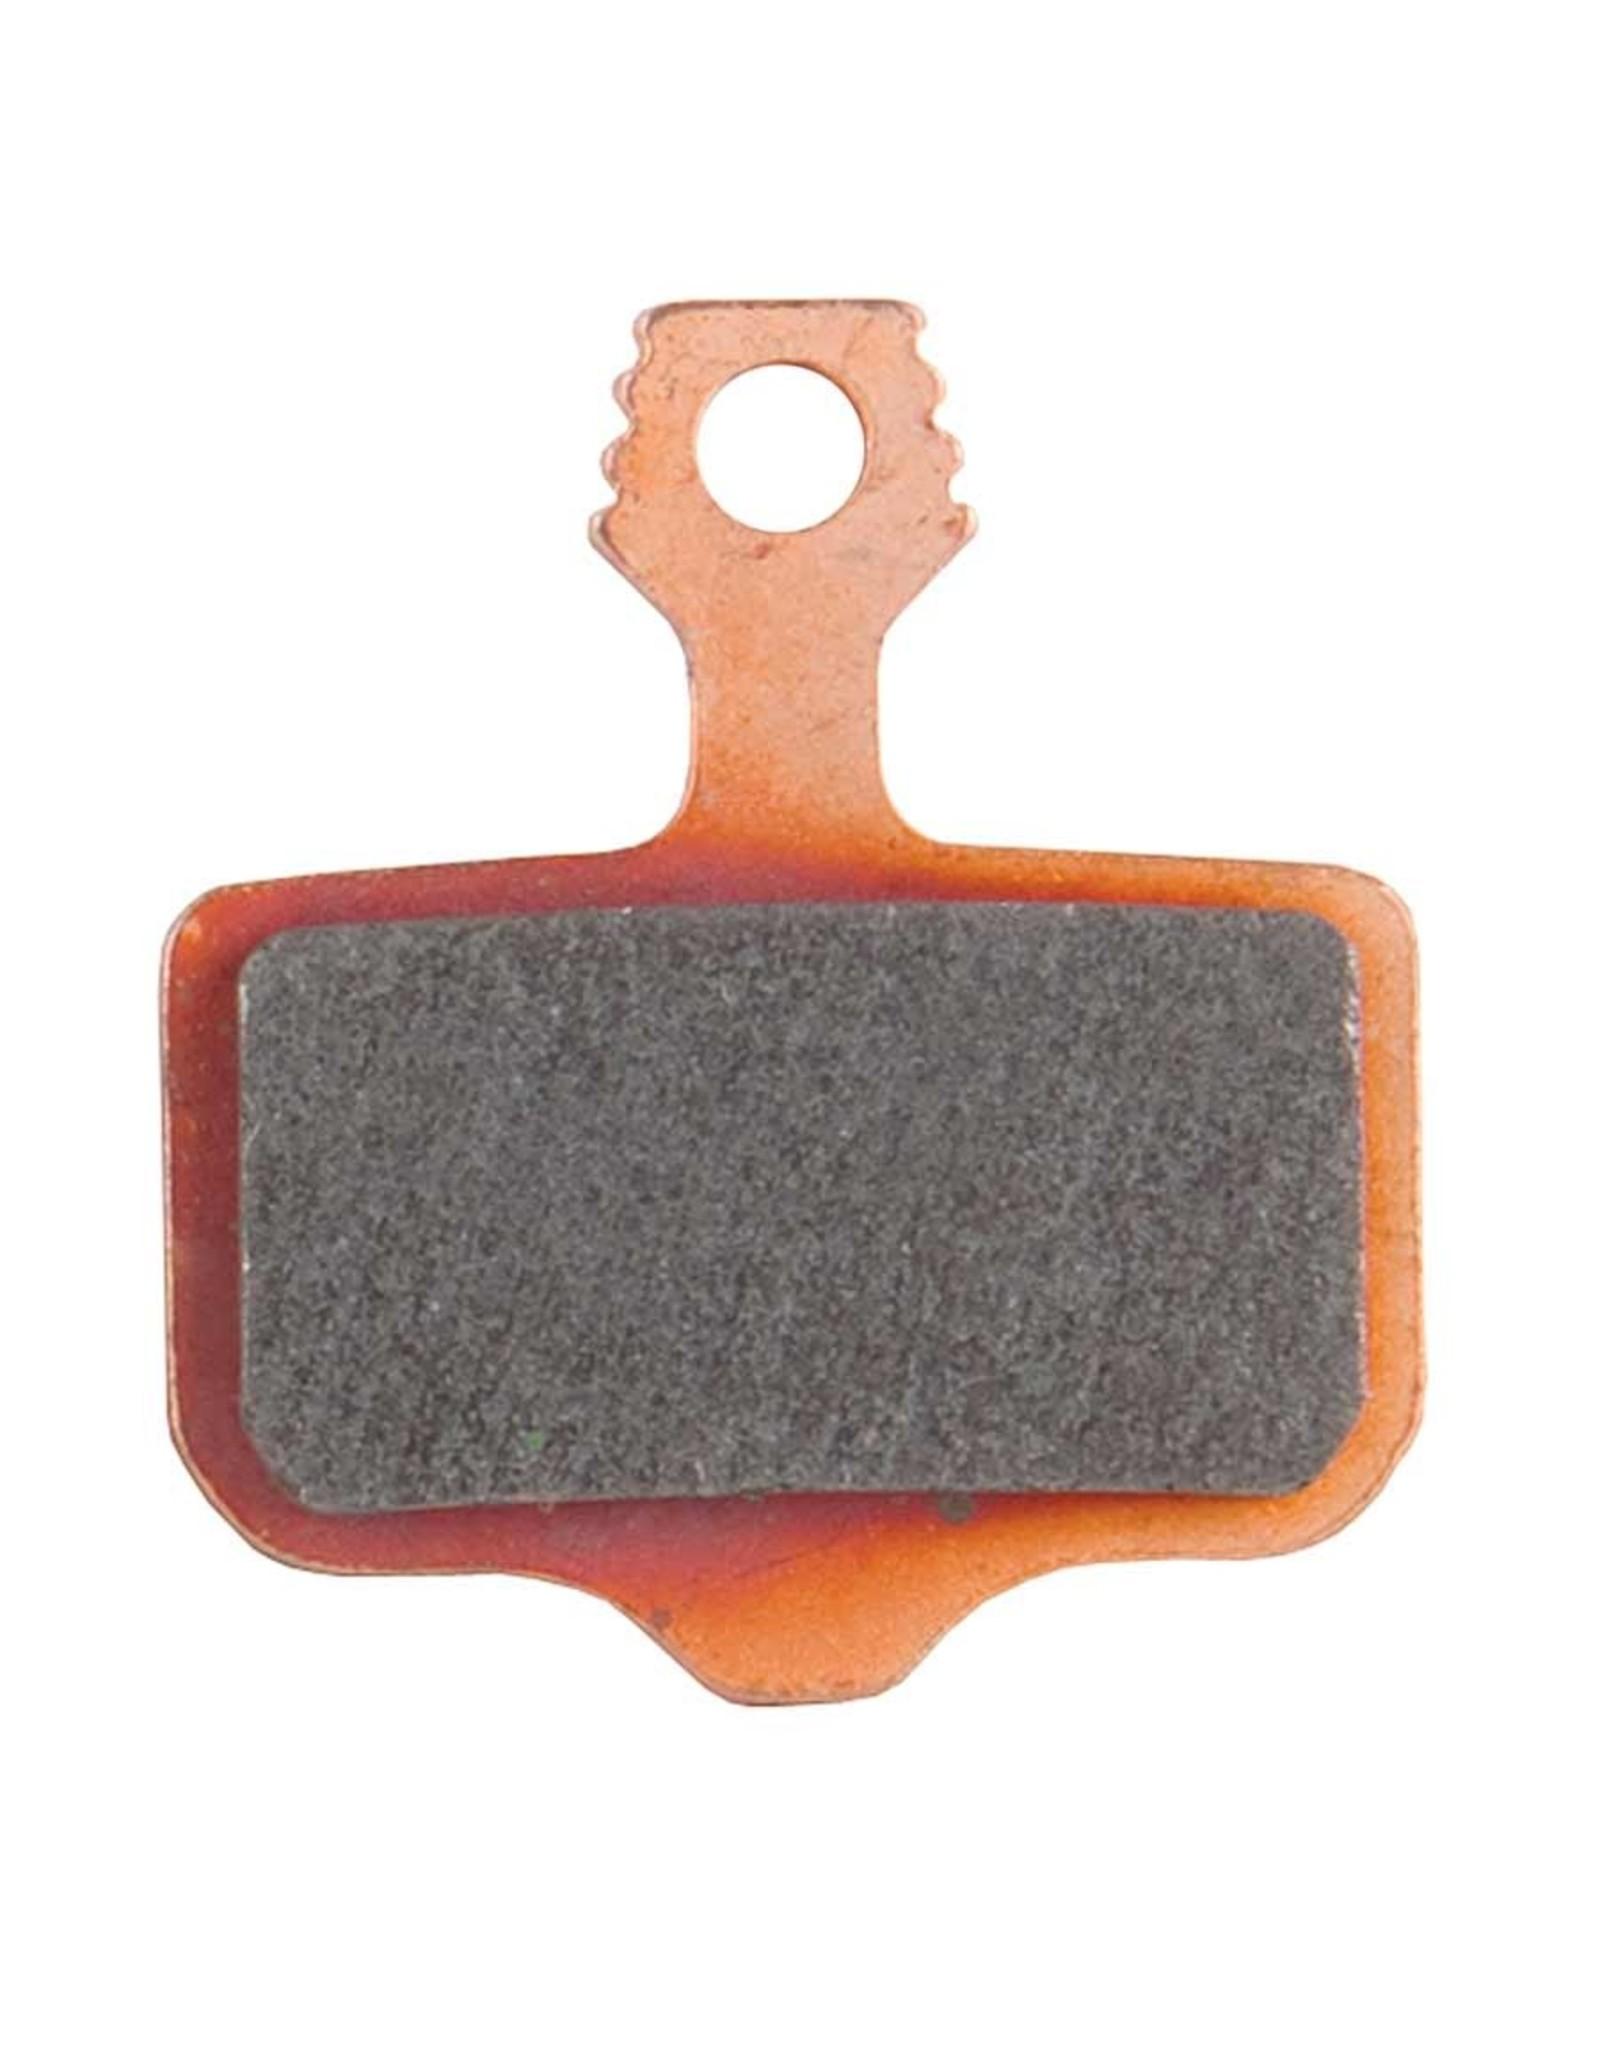 00.5315.035.010, Disc Brake Pads, Shape: Avid Elixir/SRAM Level/Force AXS HRD, Metallic, Pair